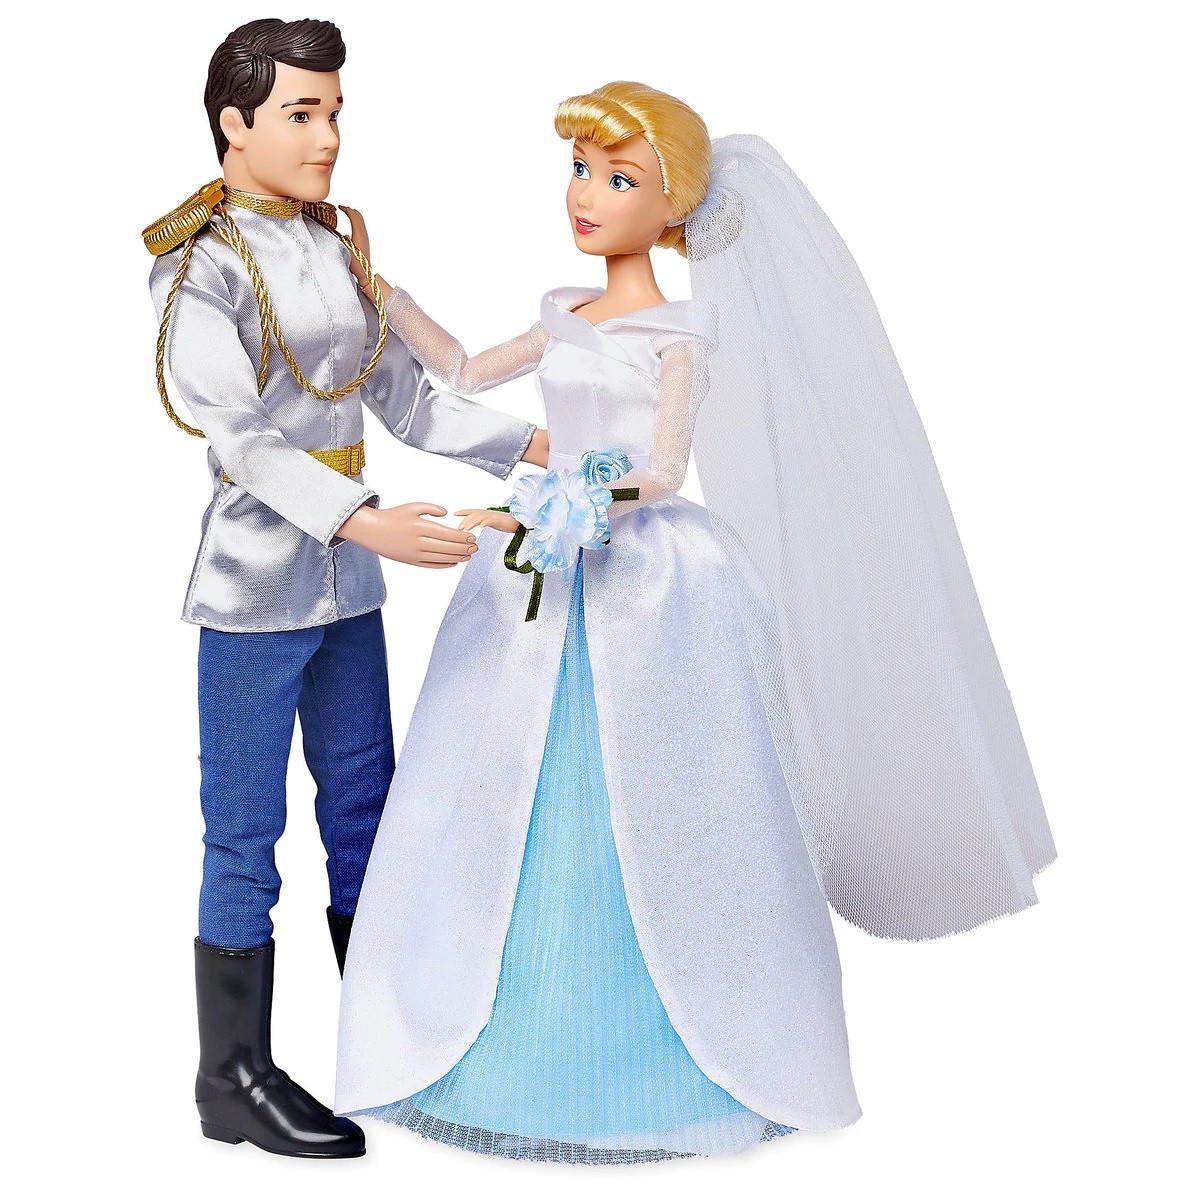 Кукла Золушка и принц Чарминг - Cinderella принцесса Дисней - Prince Charming - Disney набор кукол